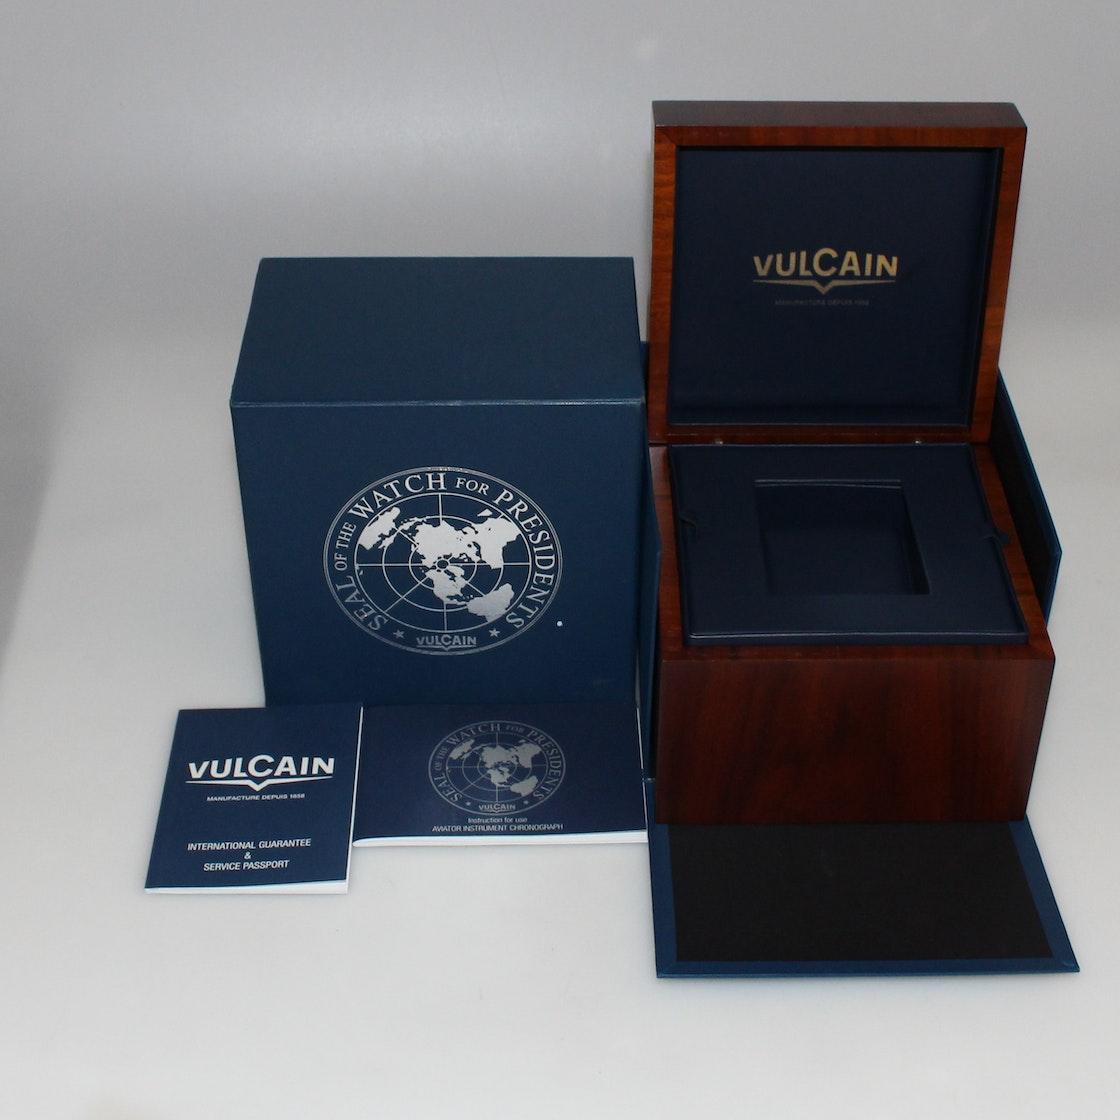 Vulcain Anniversary Heart 220536.269L